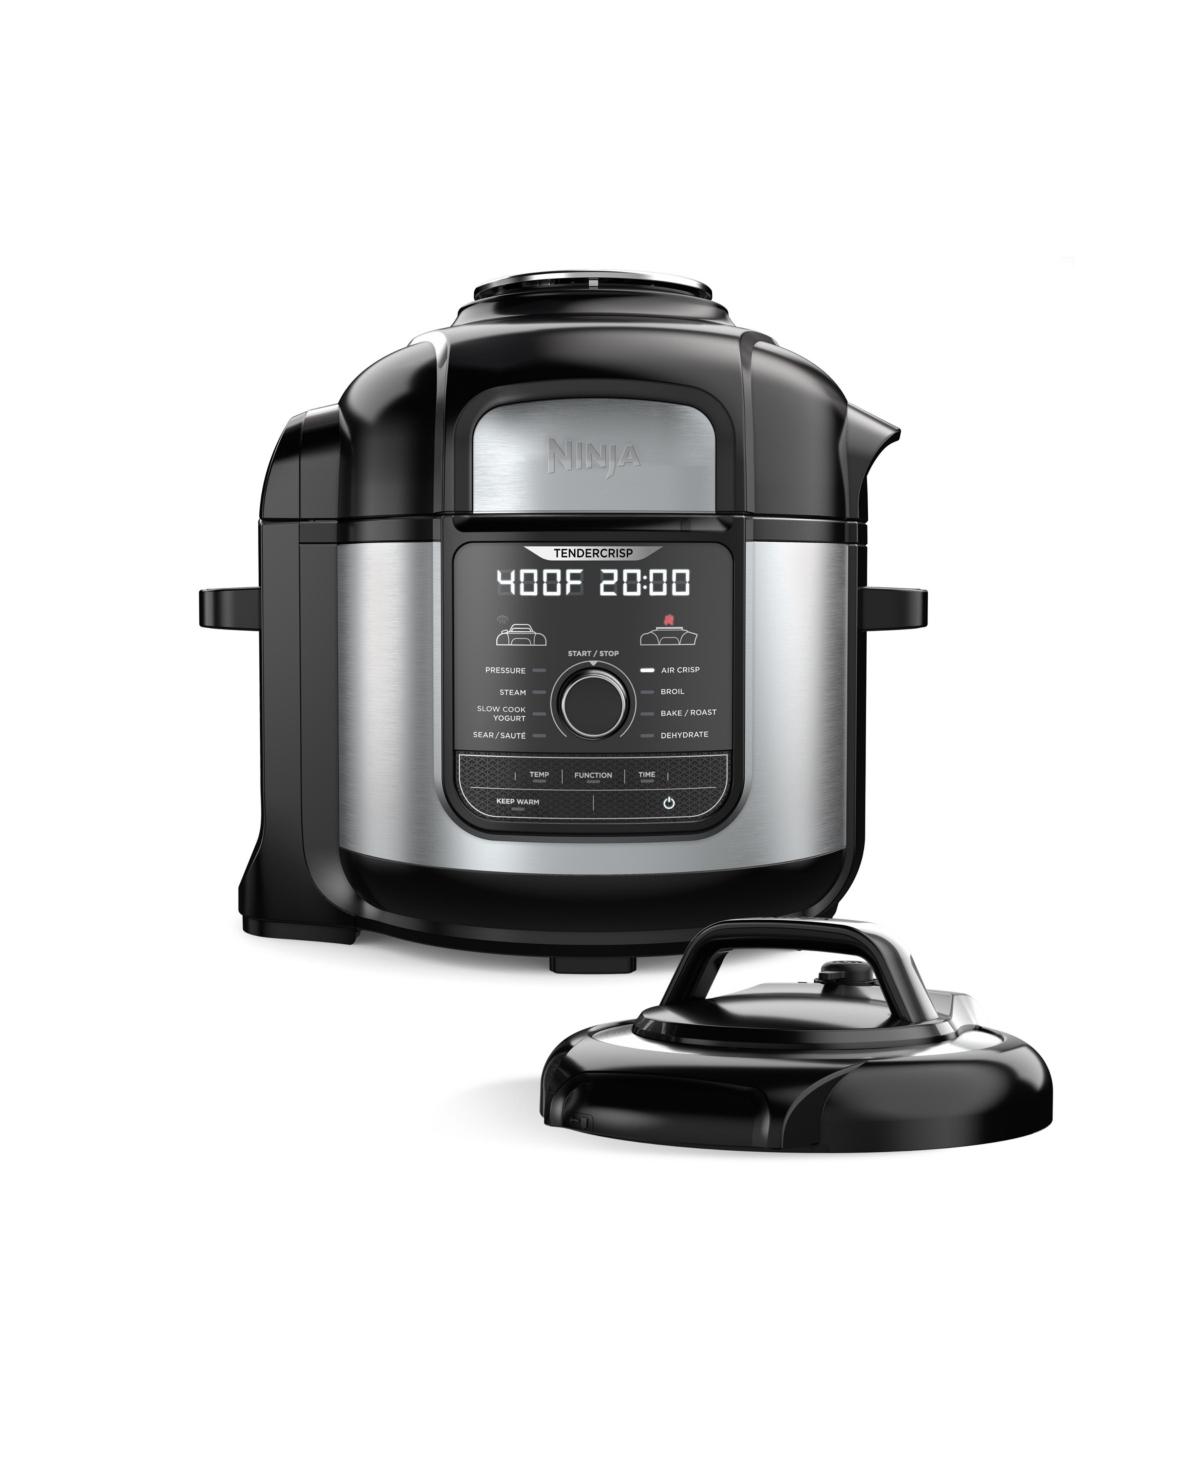 Ninja Foodi 8 Qt. Stainless Steel Pressure Cooker and Air Fryer, Silver